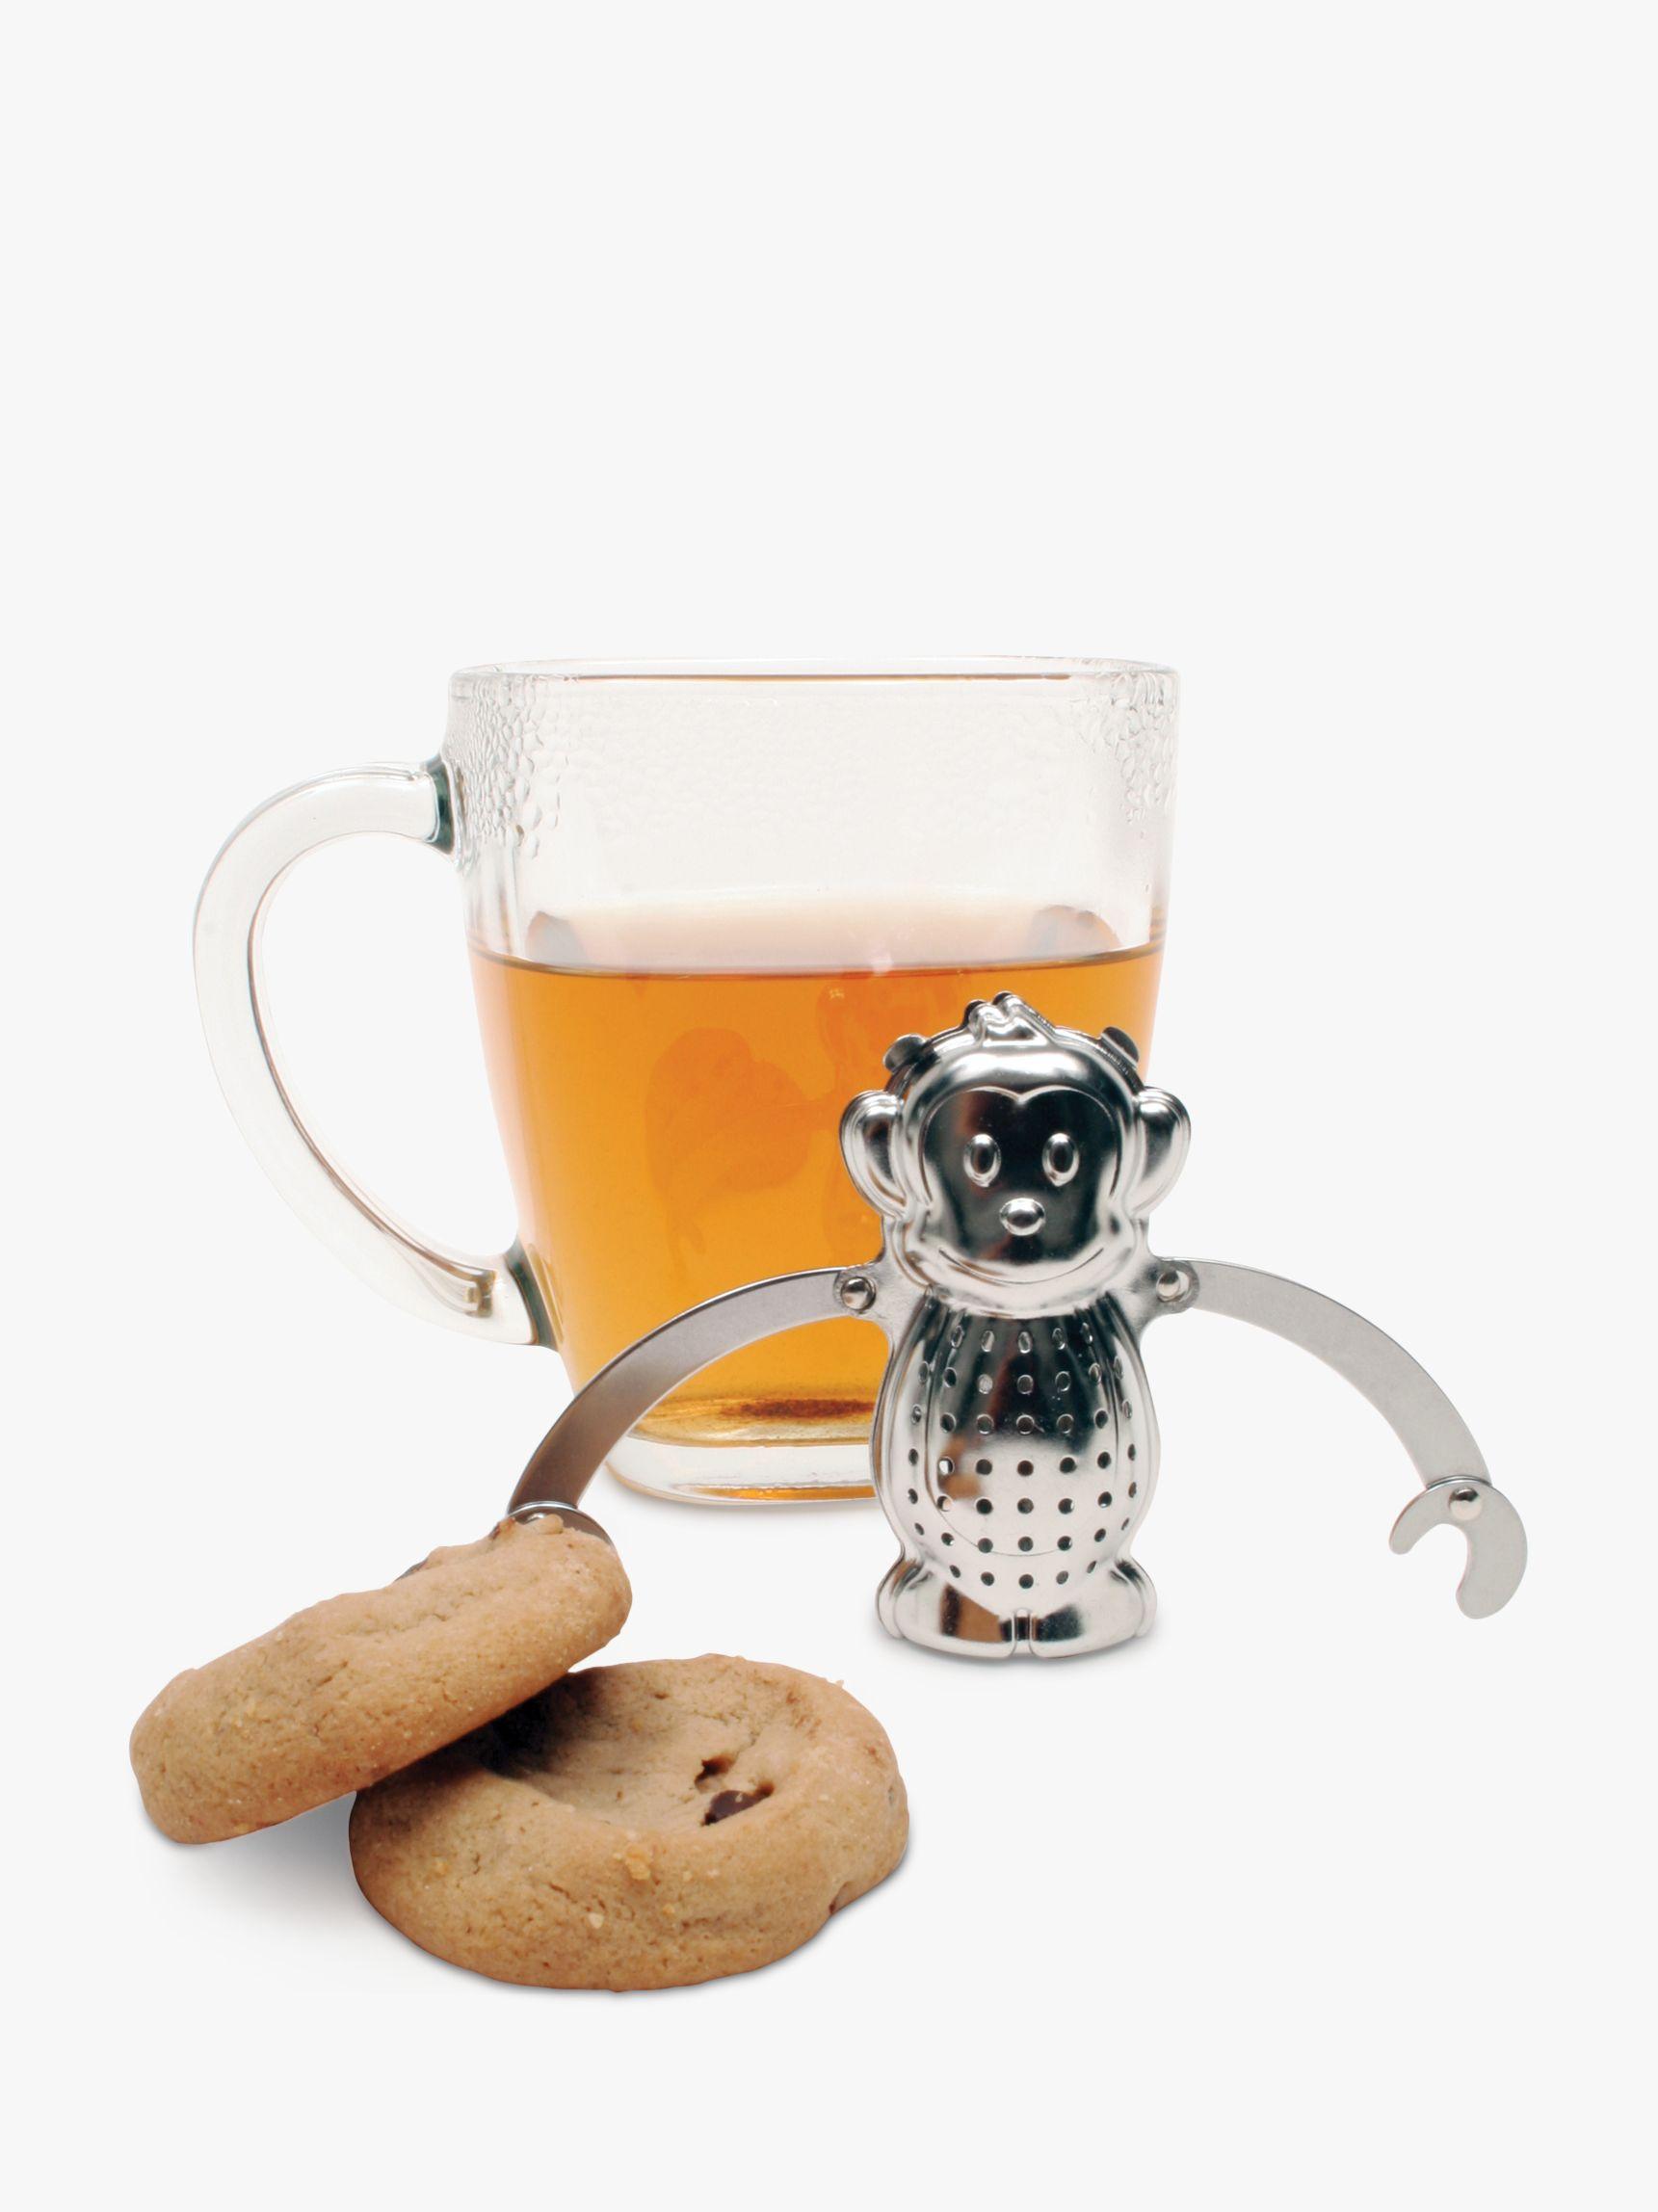 Kikkerland Kikkerland Monkey Stainless Steel Tea Infuser and Drip Tray